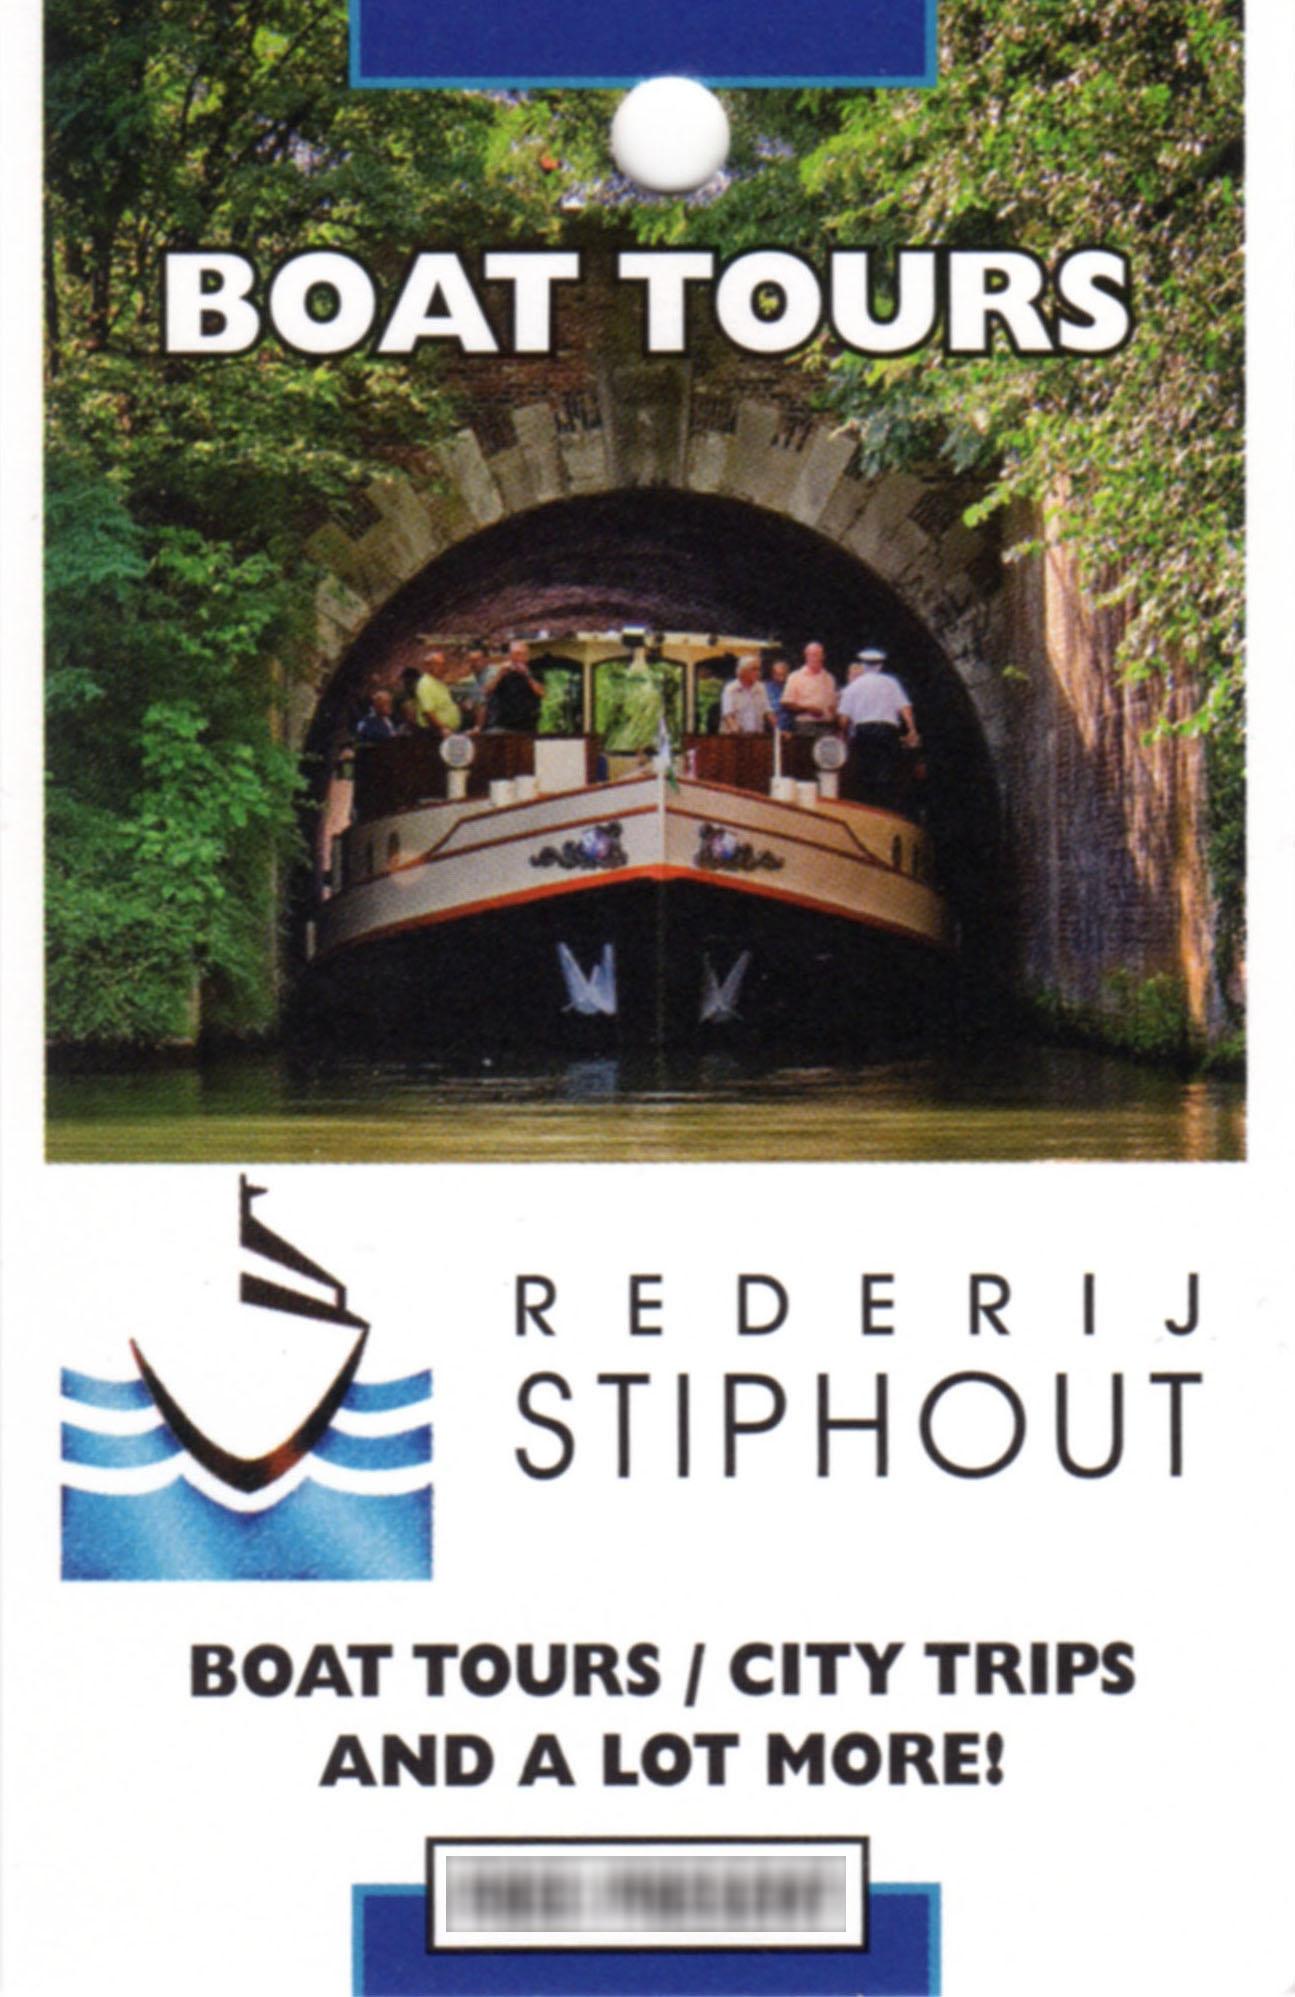 Rederij Stiphout